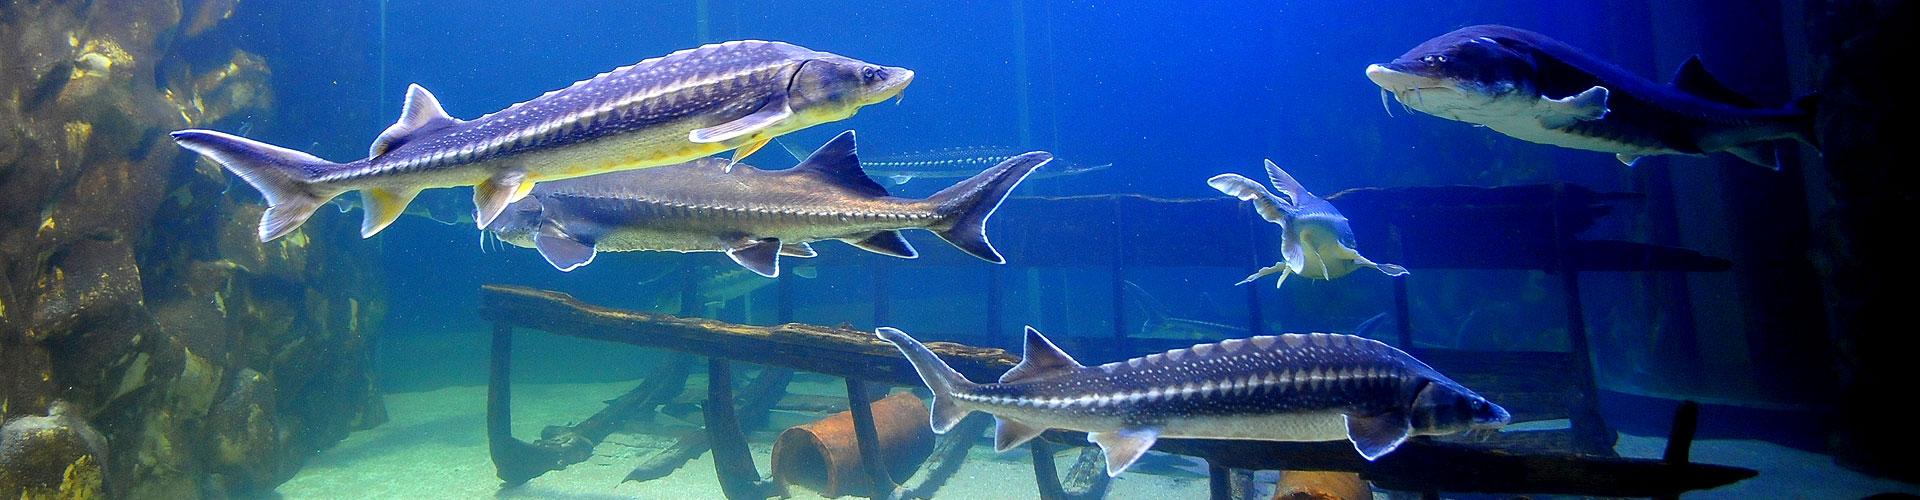 jeseterovite-ryby